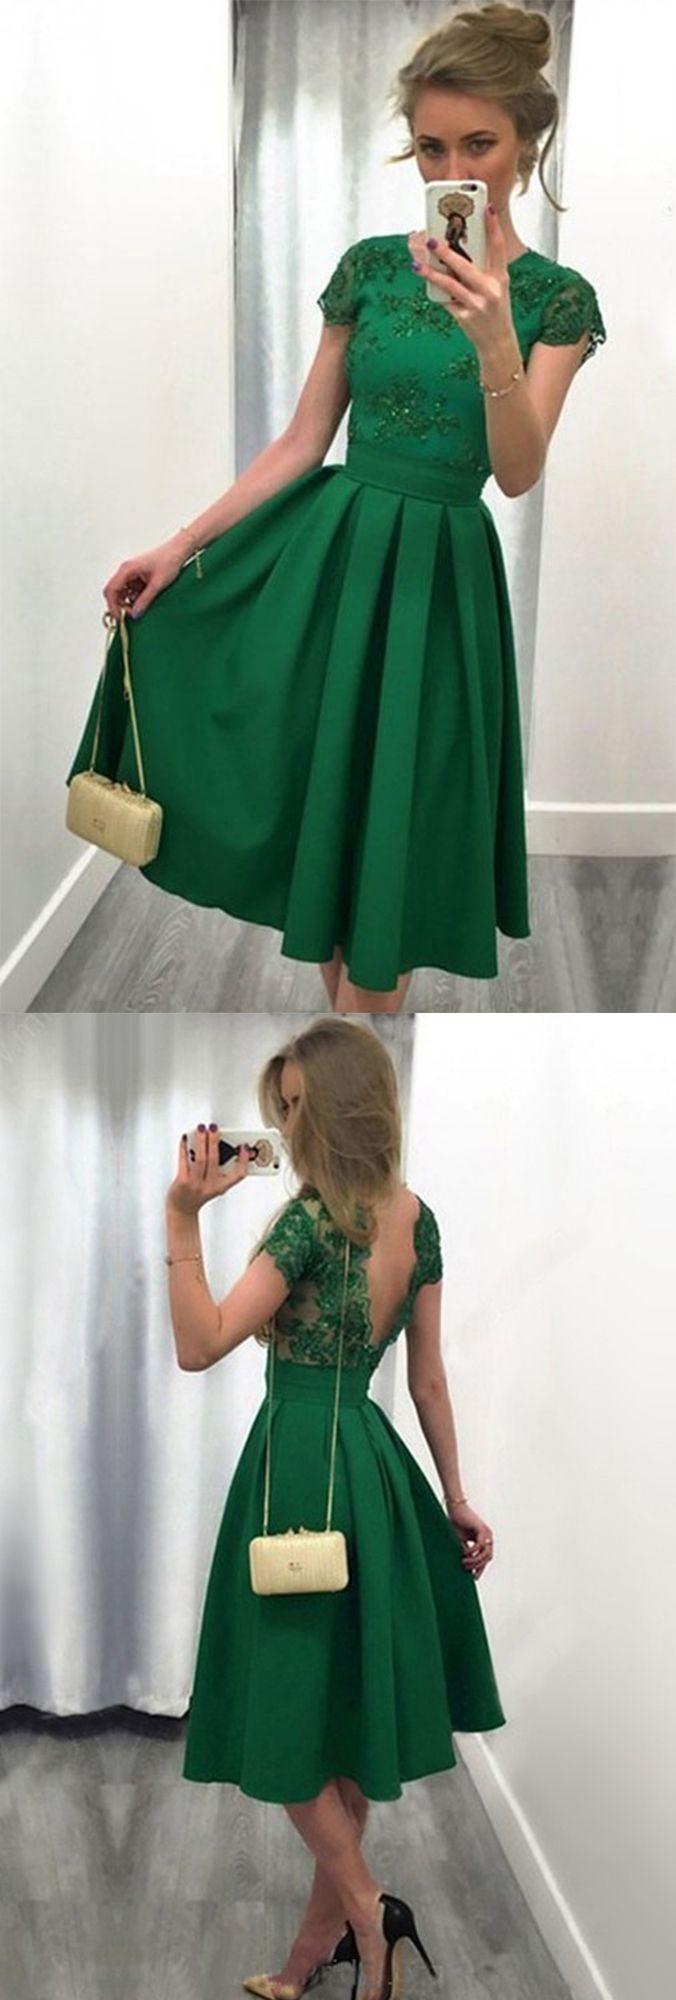 Casual prom dressesaline prom dressscoop neck satin tulle prom